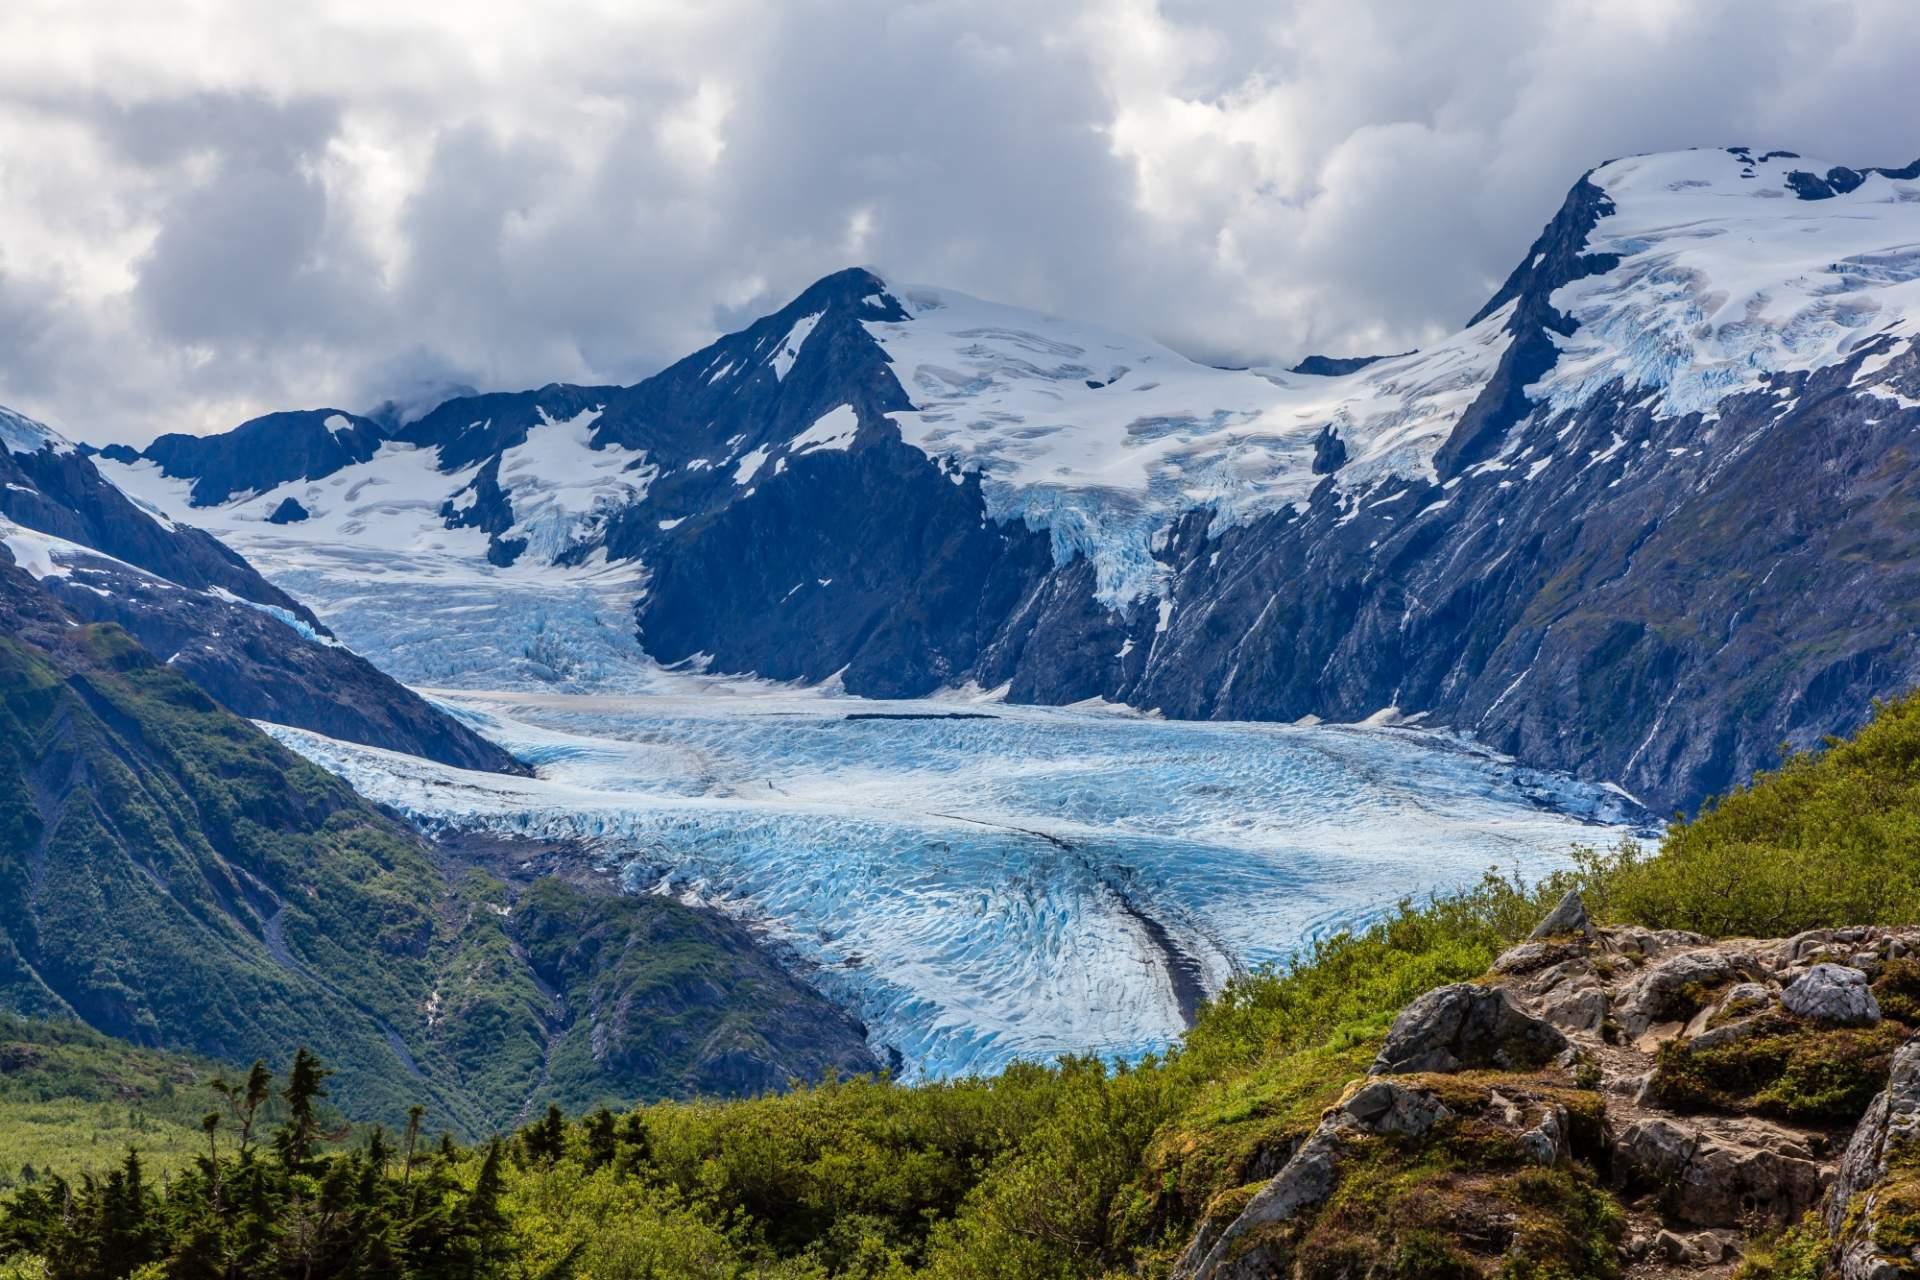 Chugach things to do visit glaciers Portage Glacier Kathleen Barth KB Hi Res 140726 9277